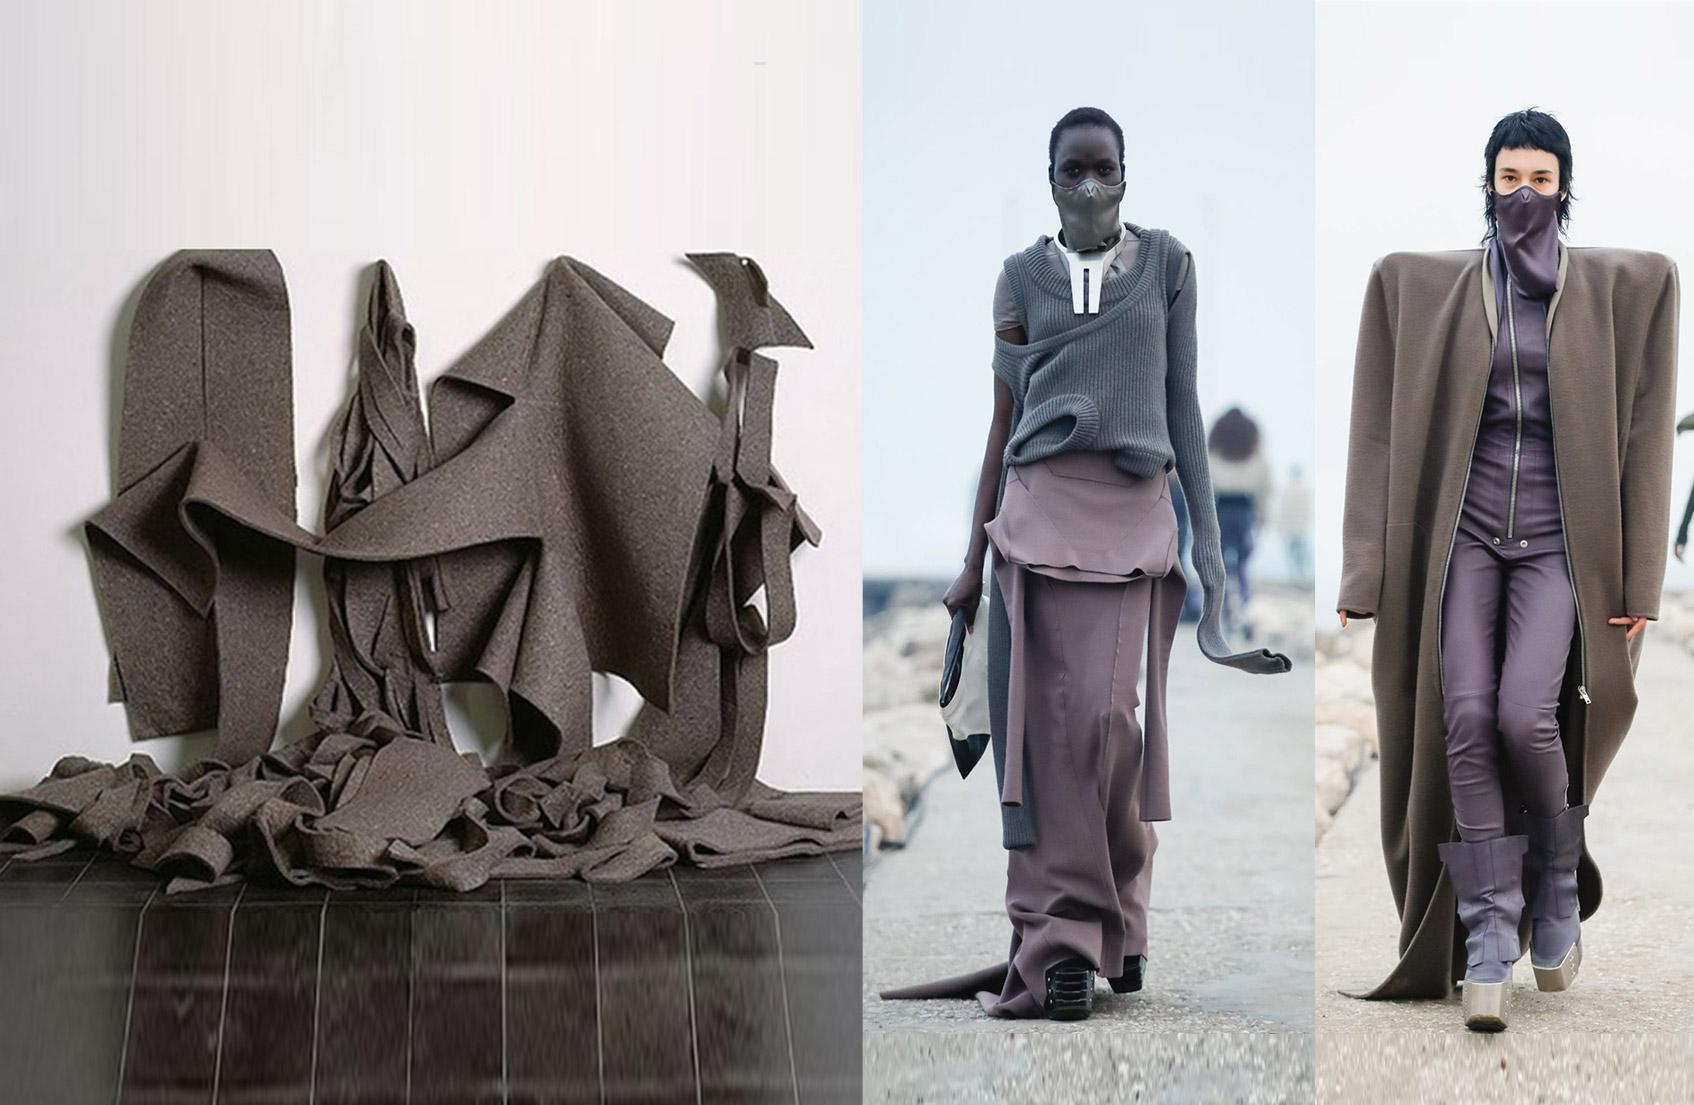 Скульптура из фетра без названия, Роберт Моррис, 1969; Rick Owens осень-зима 21/22